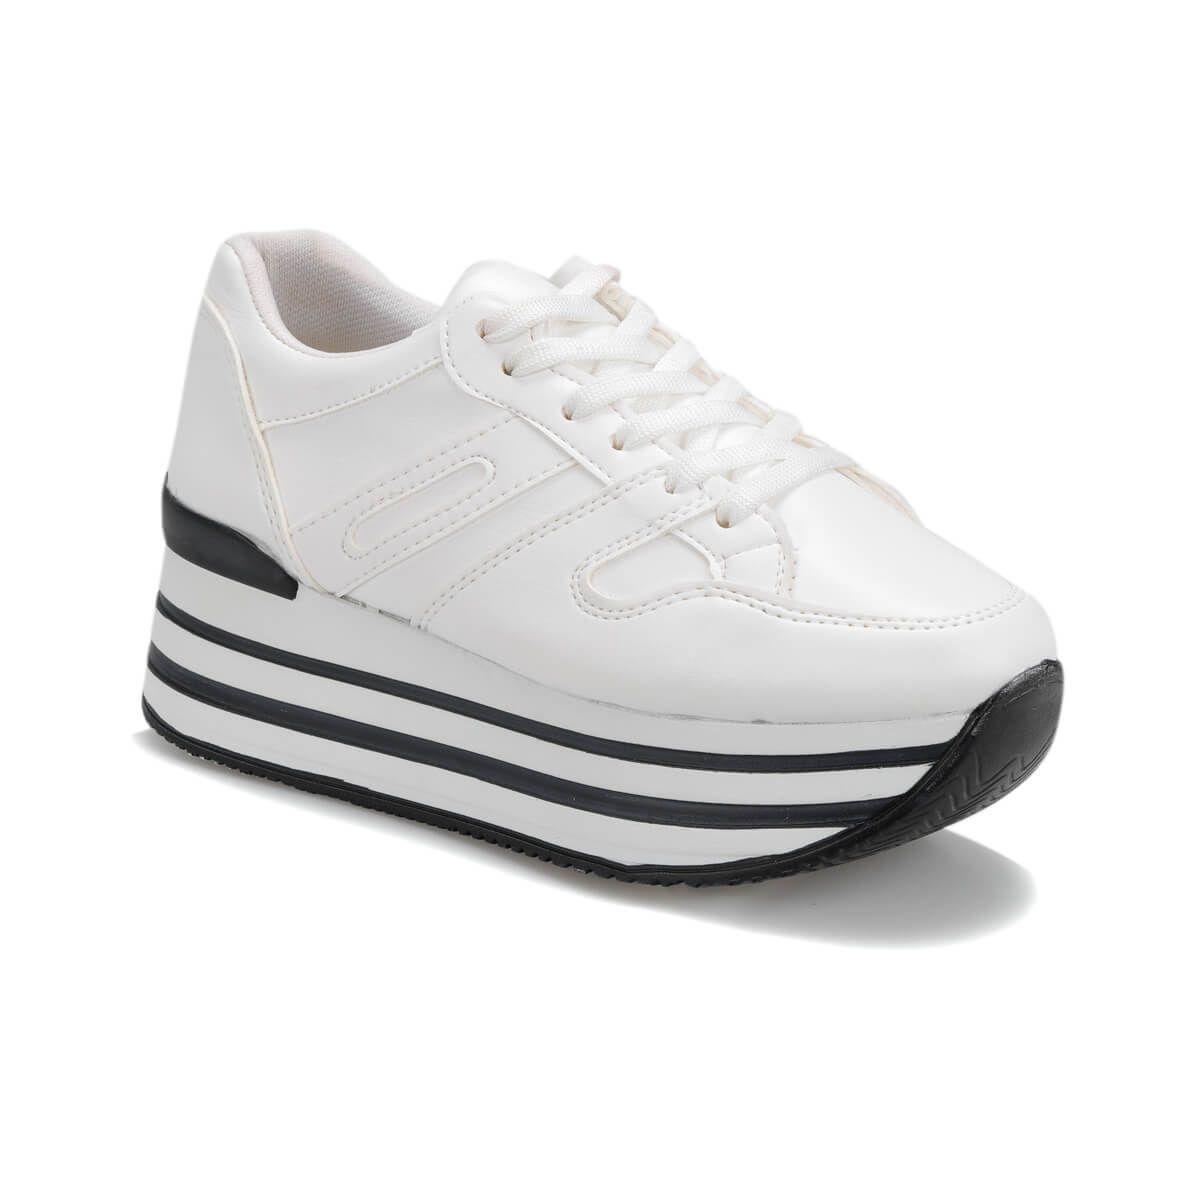 Butigo 19s 800 Beyaz Kadin Sneaker Ayakkabi 2019 Ayakabi Ve Canta Pinterest Sneakers Ve Shoes